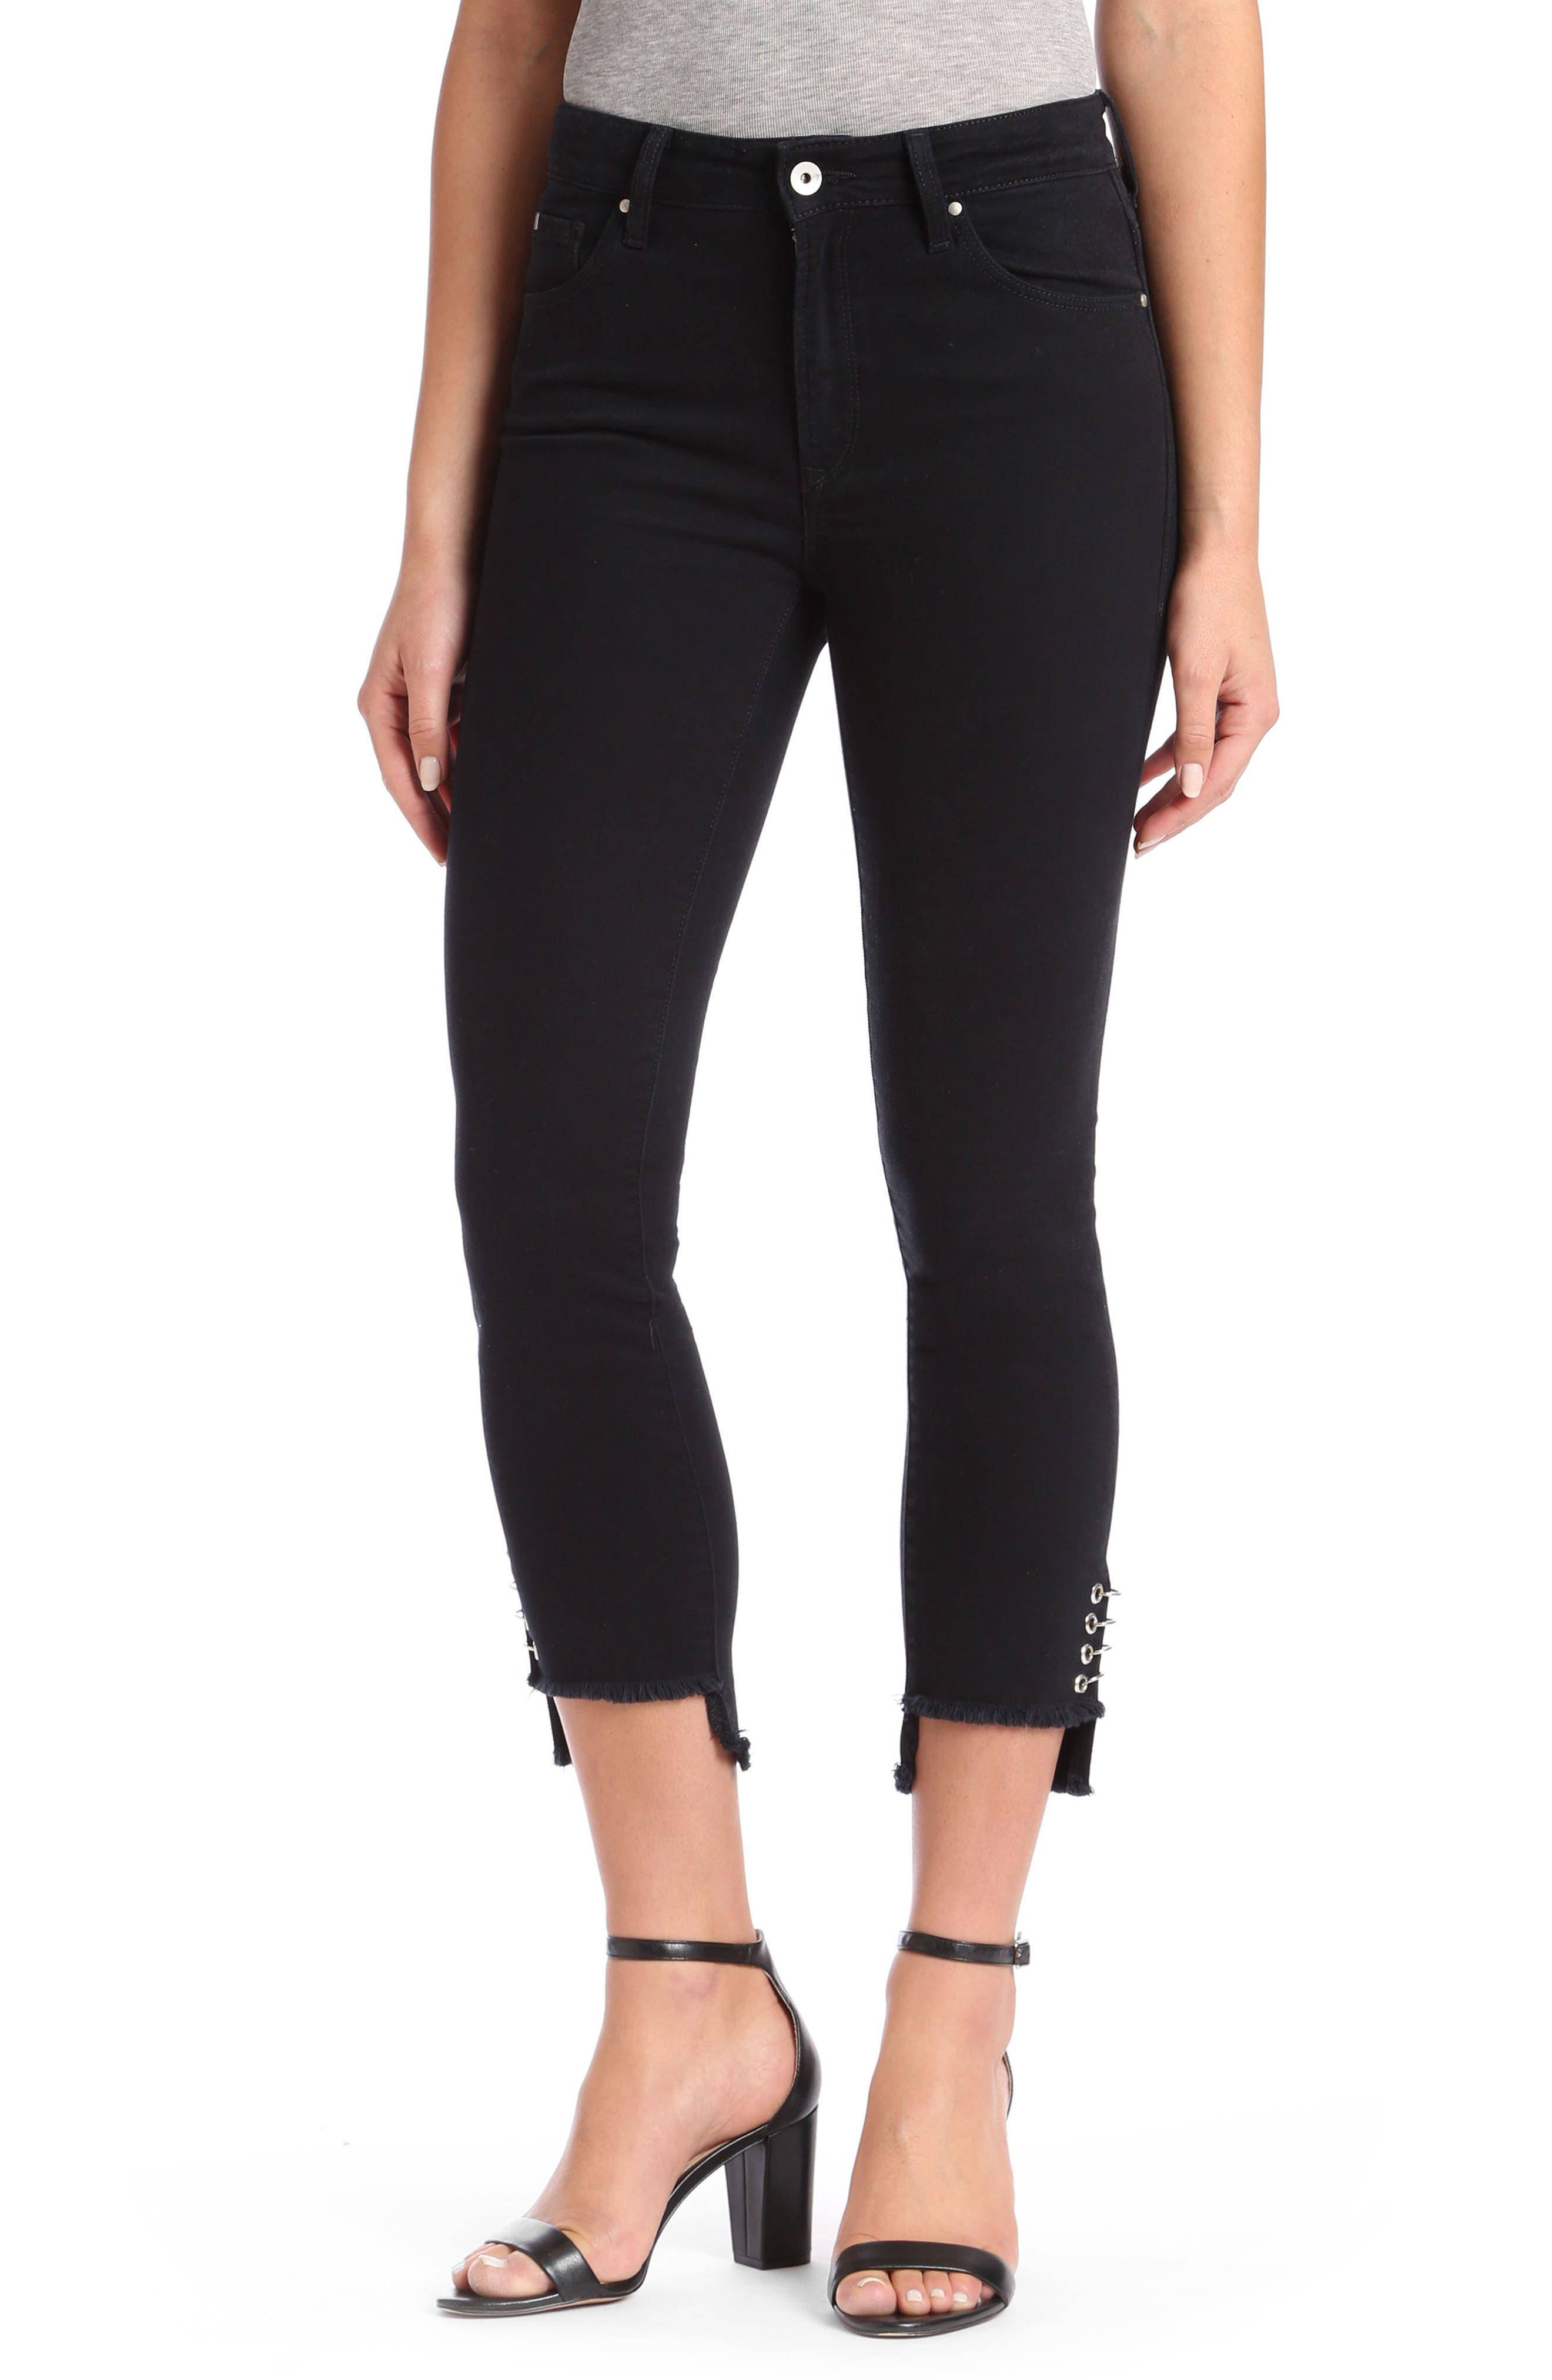 Mavi Tess Super Skinny Black Jeans,                         Main,                         color, Black Piercing Gold